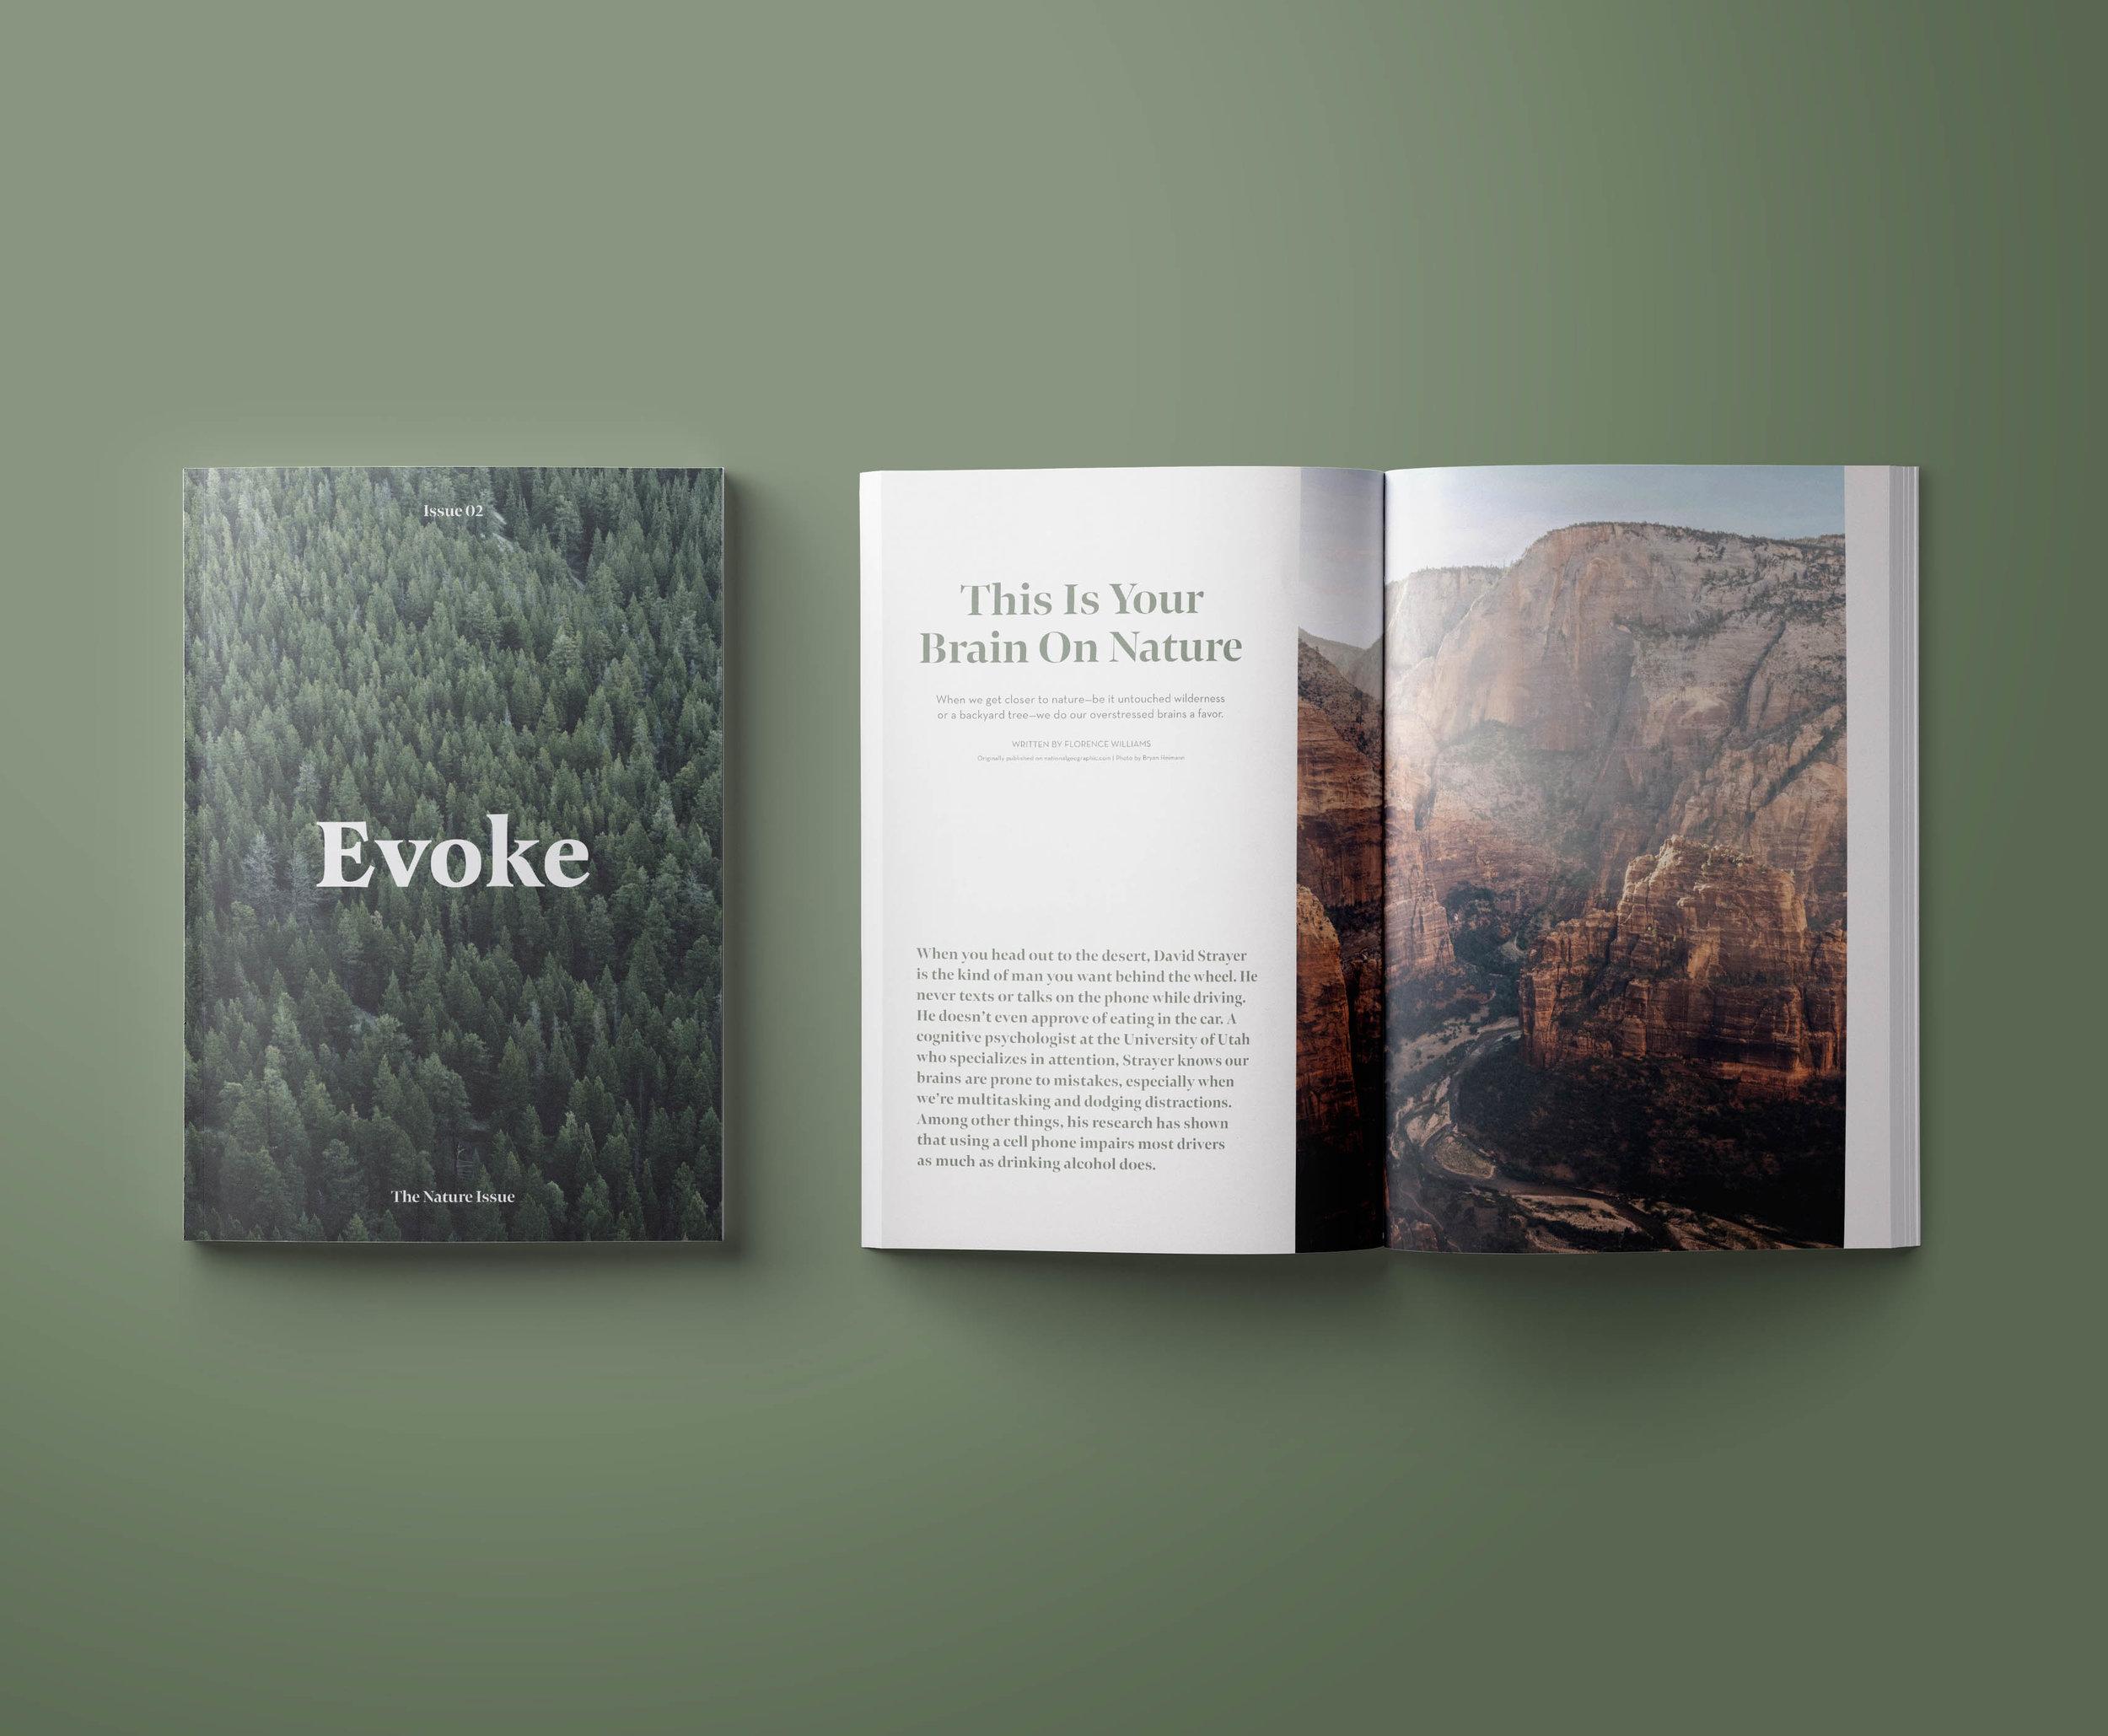 Evoke_CoverSpread.jpg